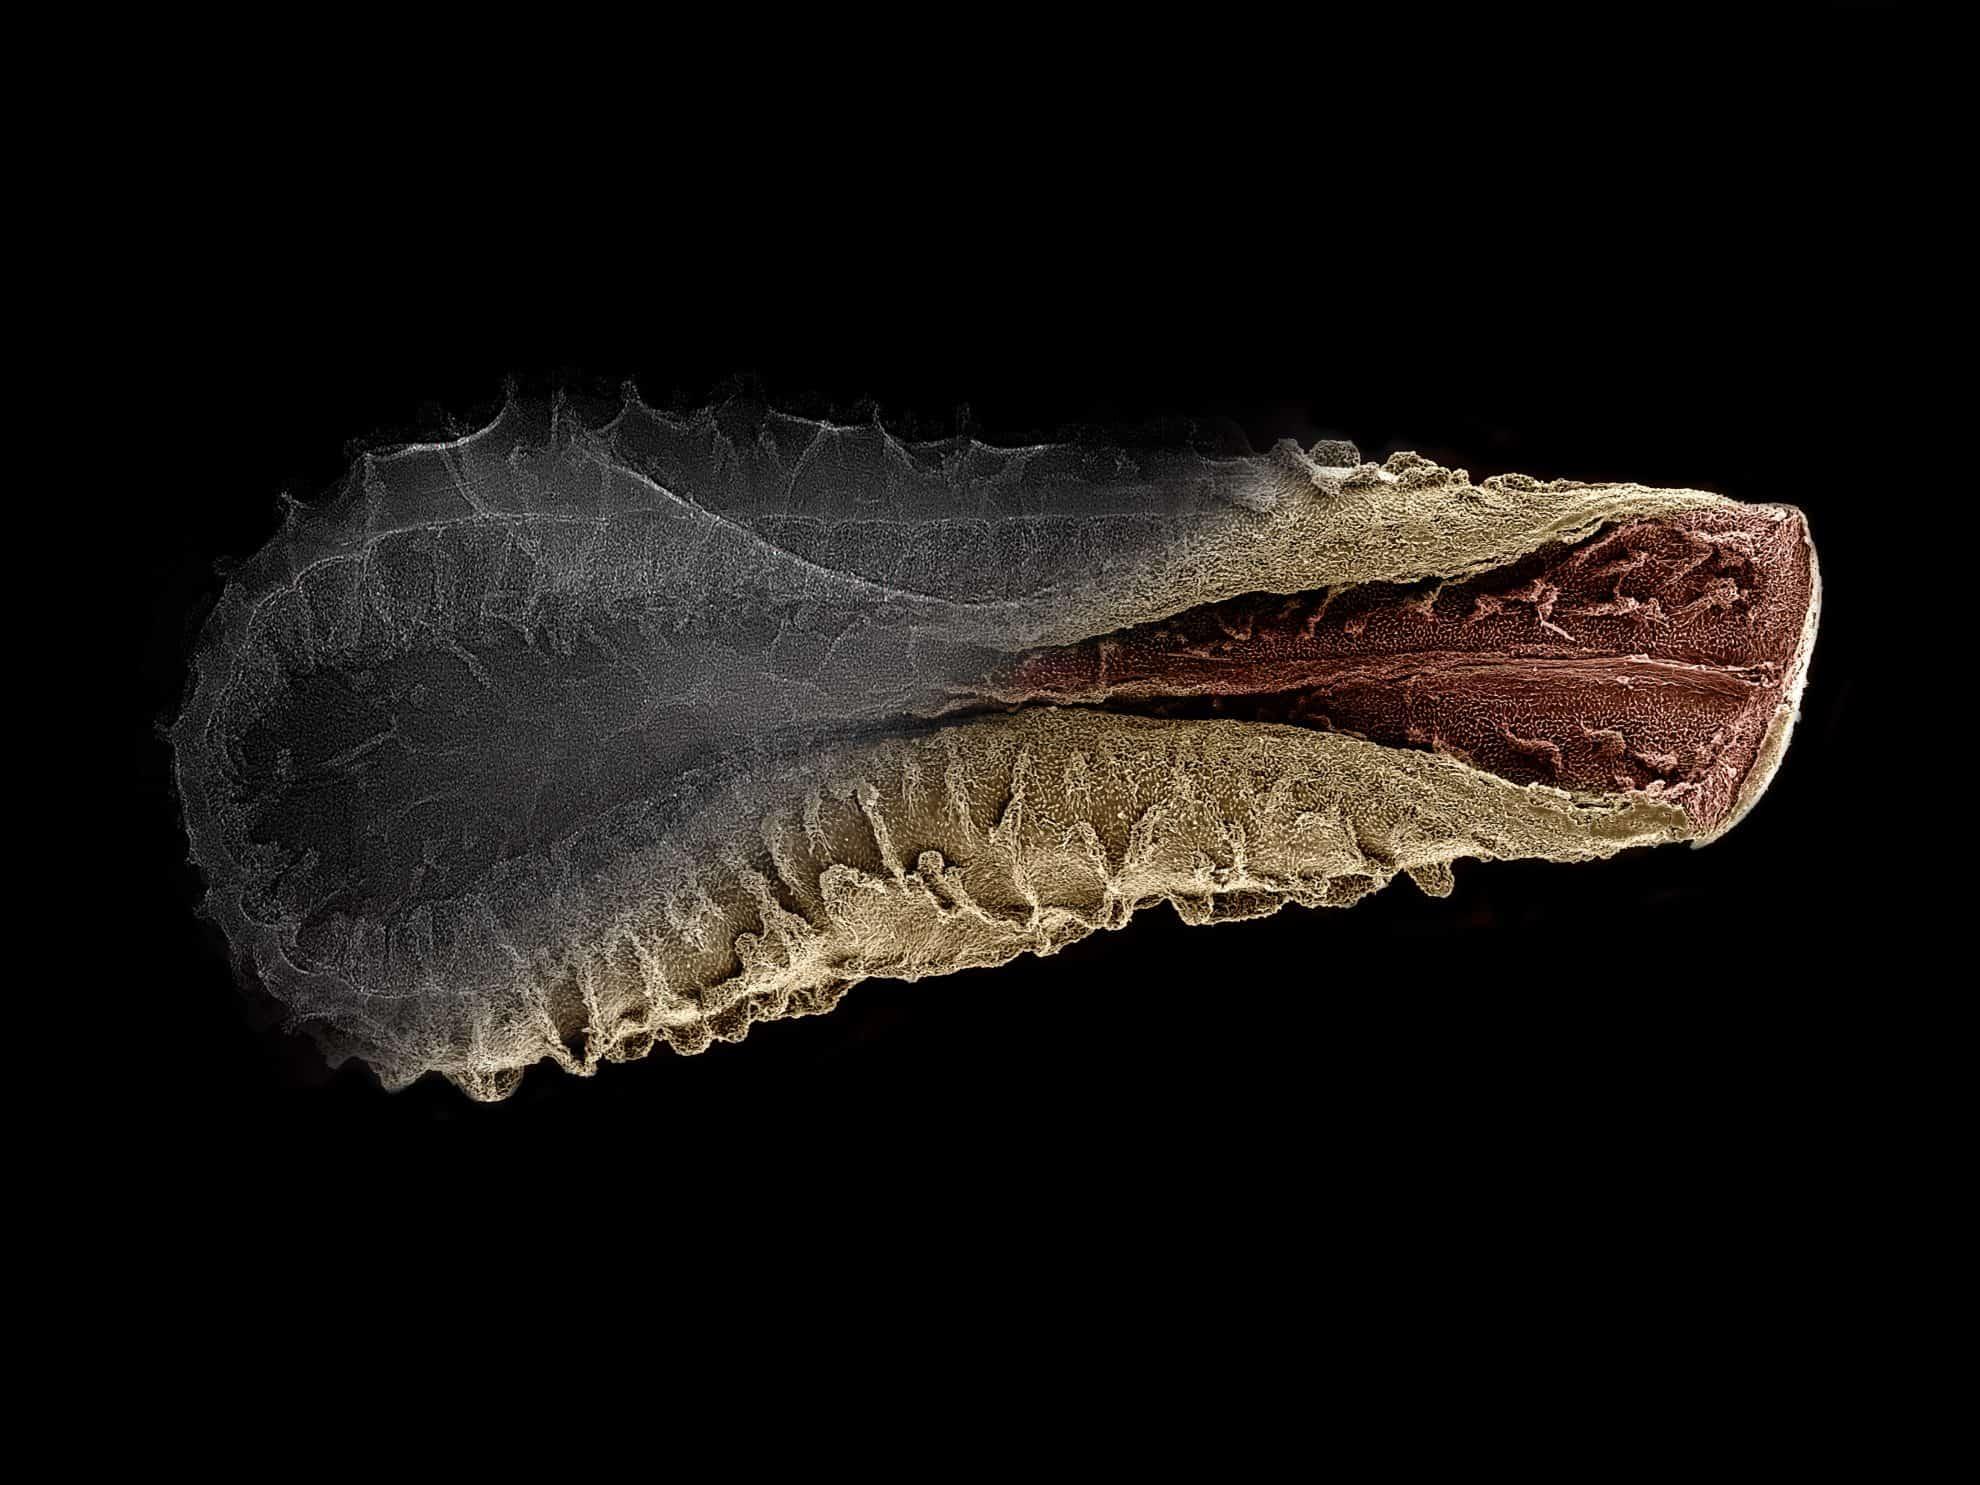 Microscopy image of seed